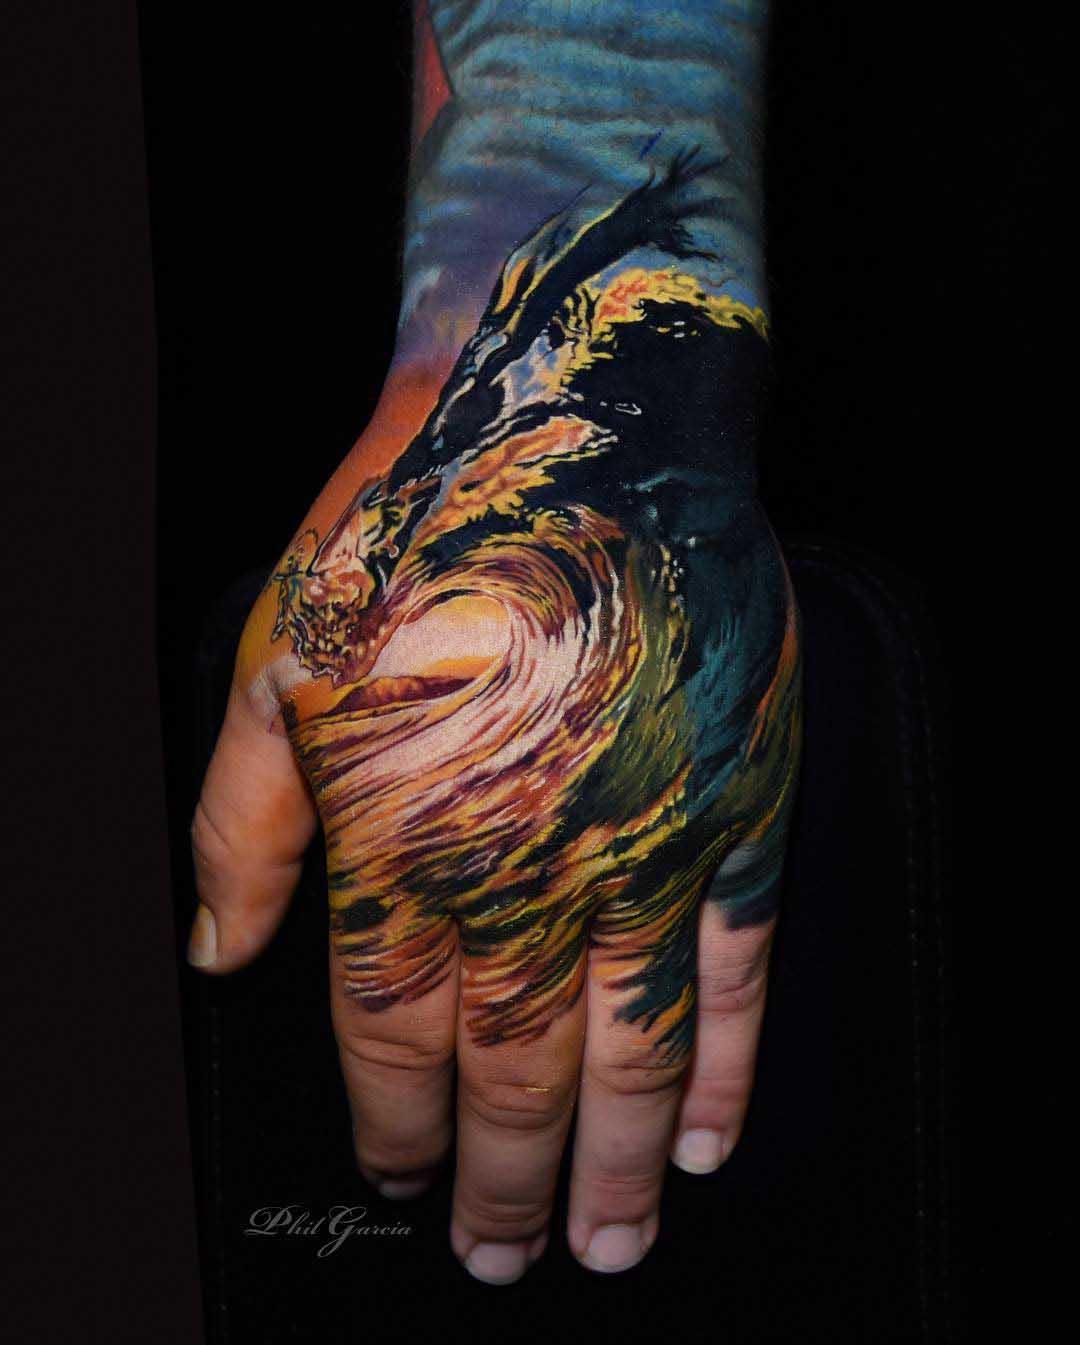 hand tattoo ocean wave